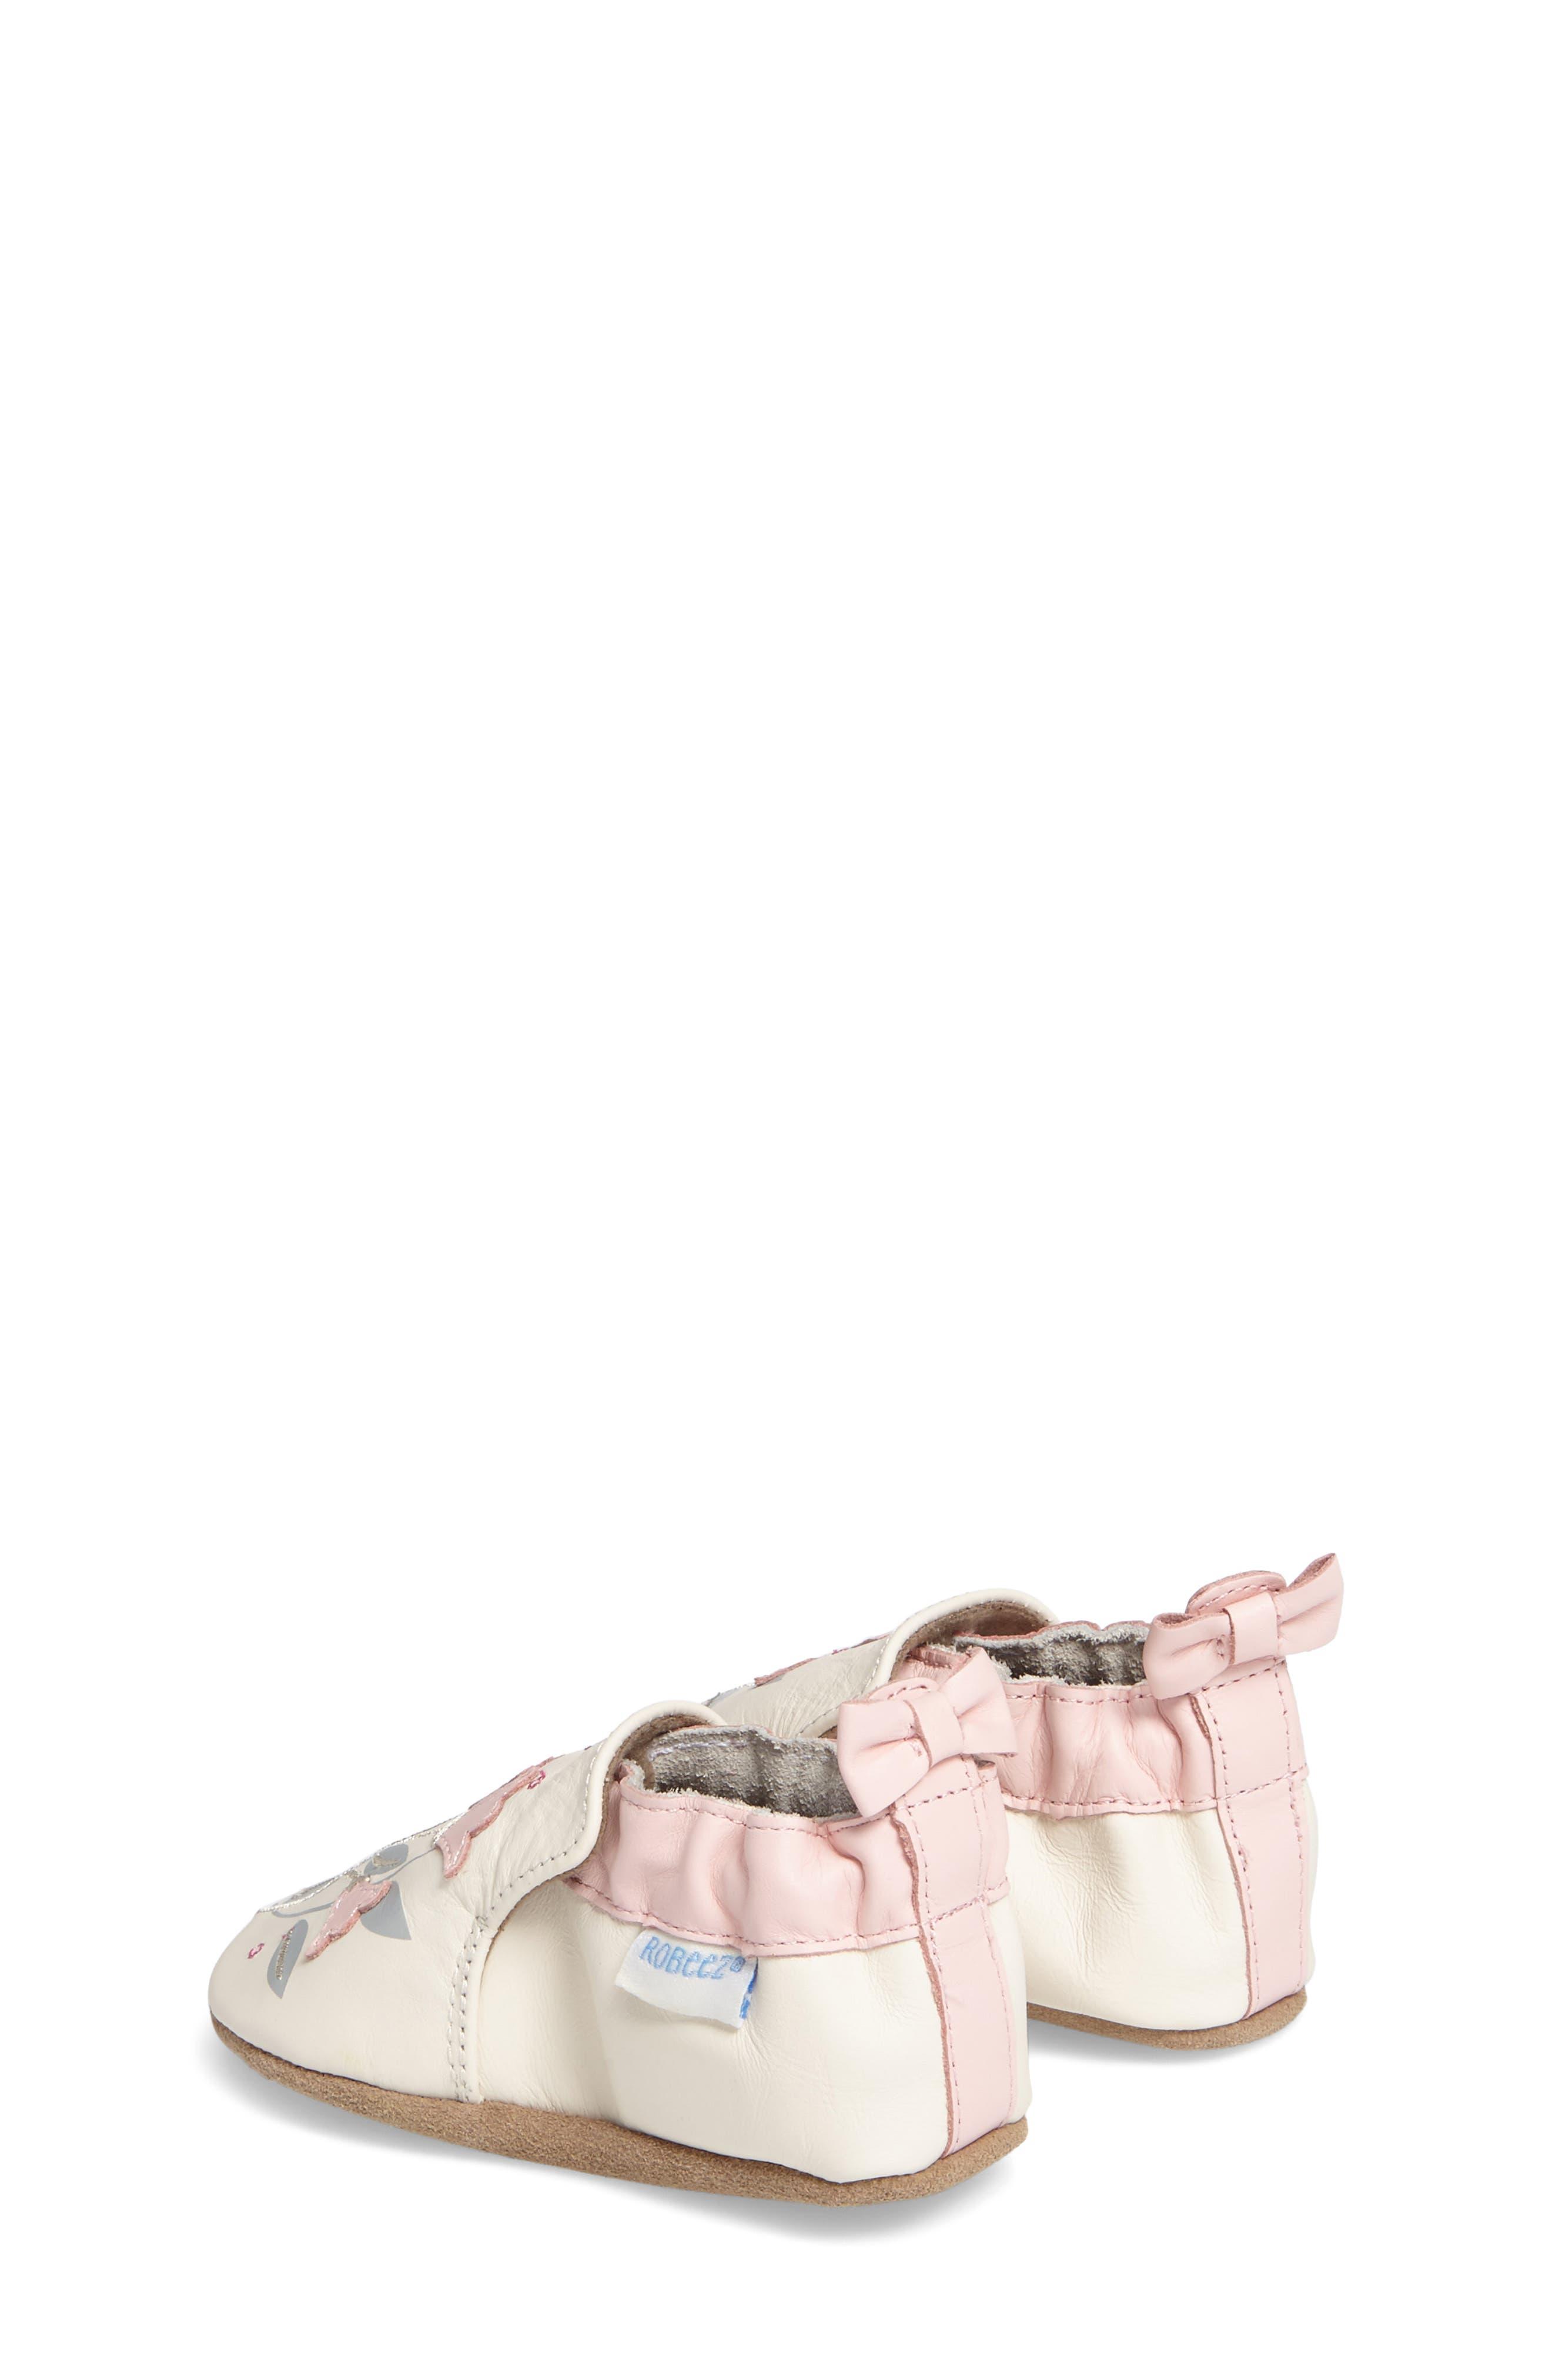 Rosealean Crib Shoe,                             Alternate thumbnail 2, color,                             650